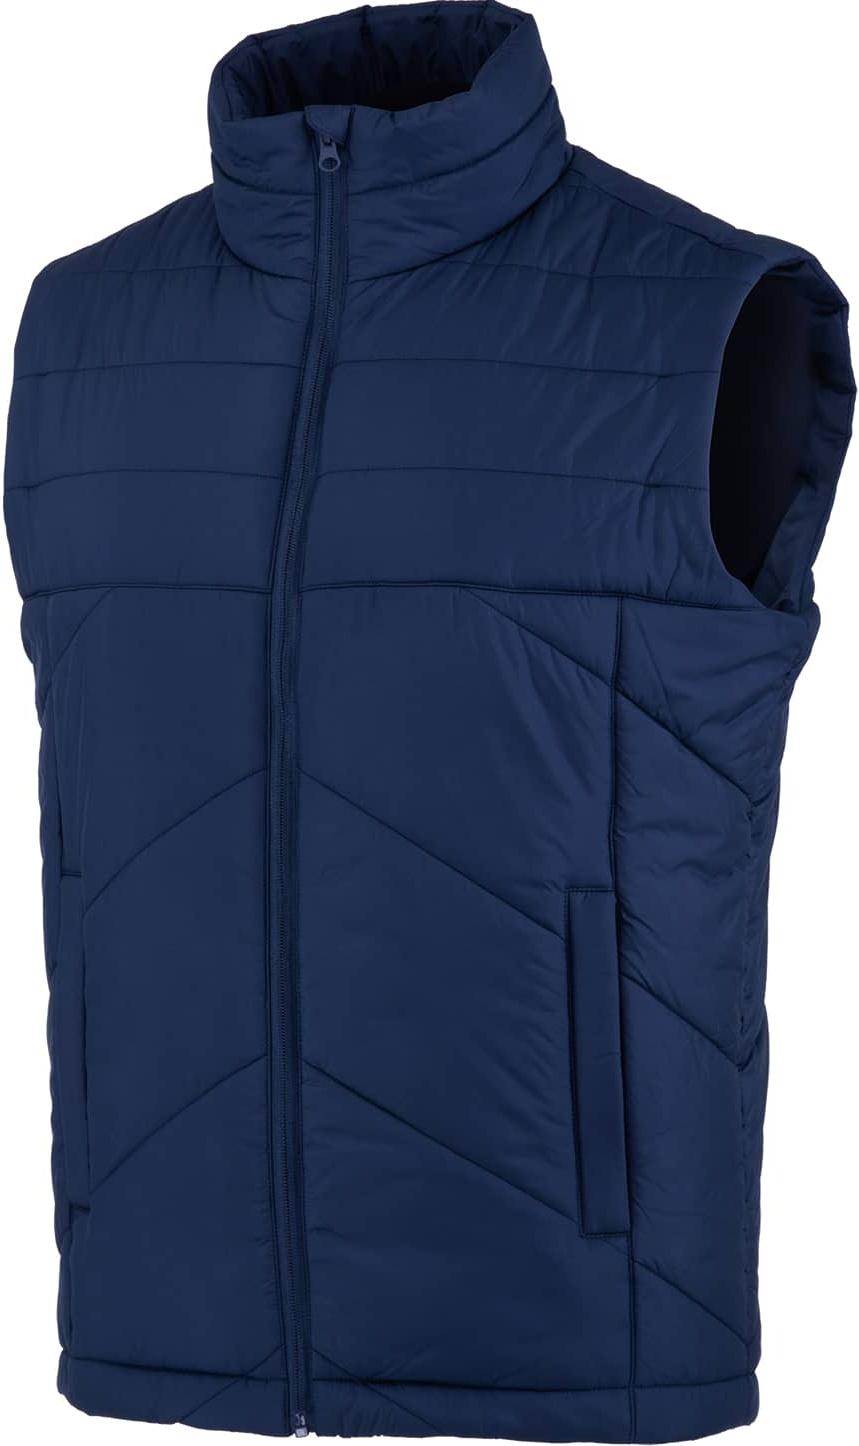 Jögel Жилет утепленный ESSENTIAL Padded Vest, синий